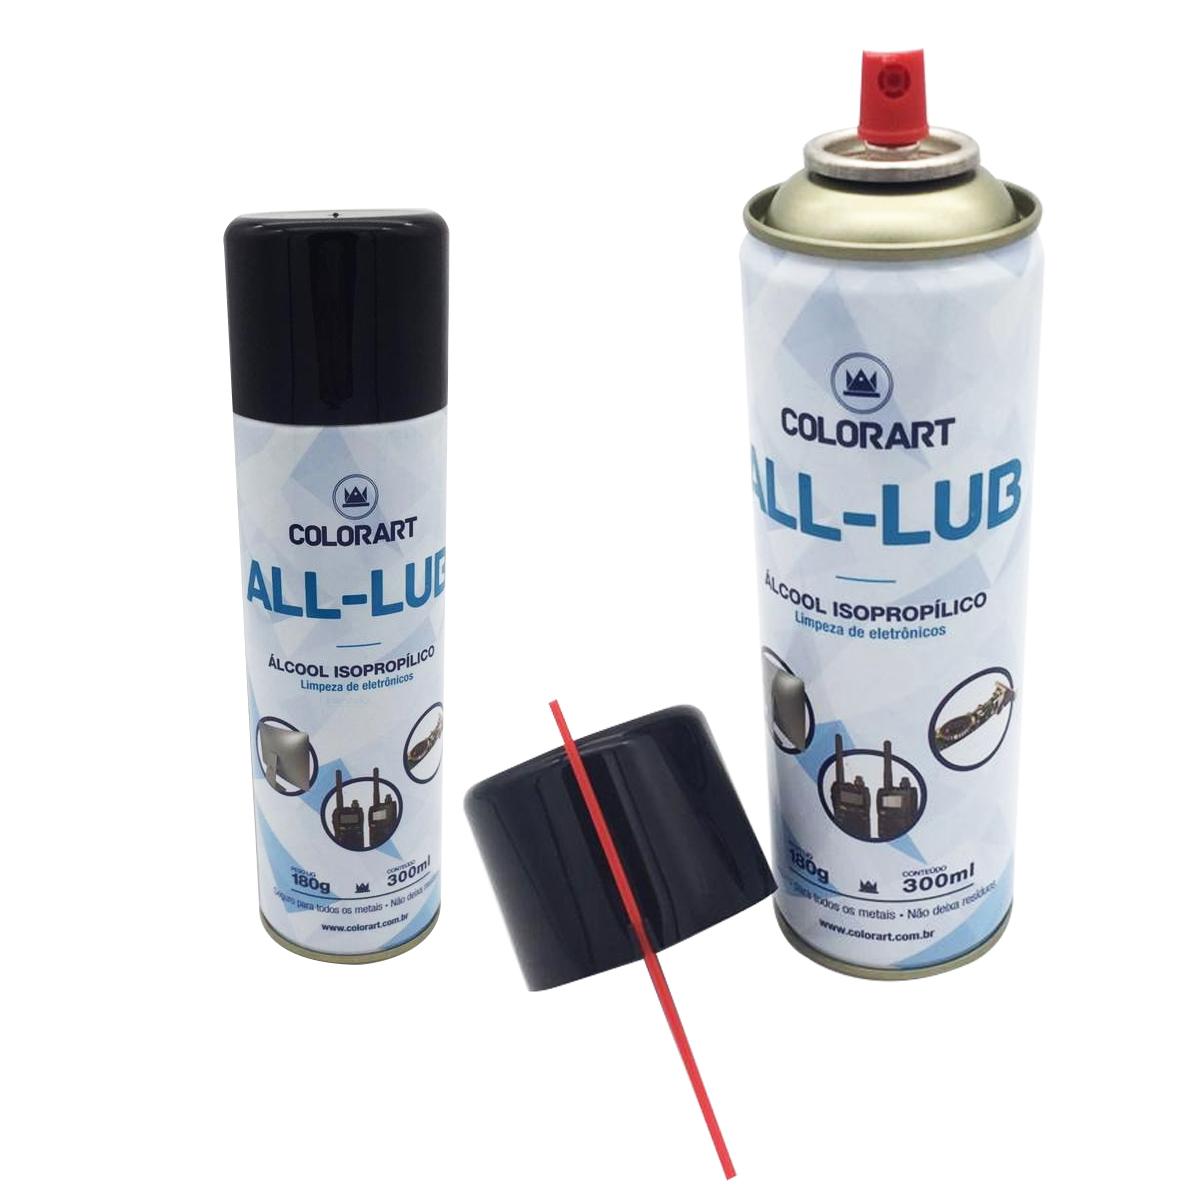 10 Spray Álcool Isopropílico Limeza Eletronicos Celular 300ml